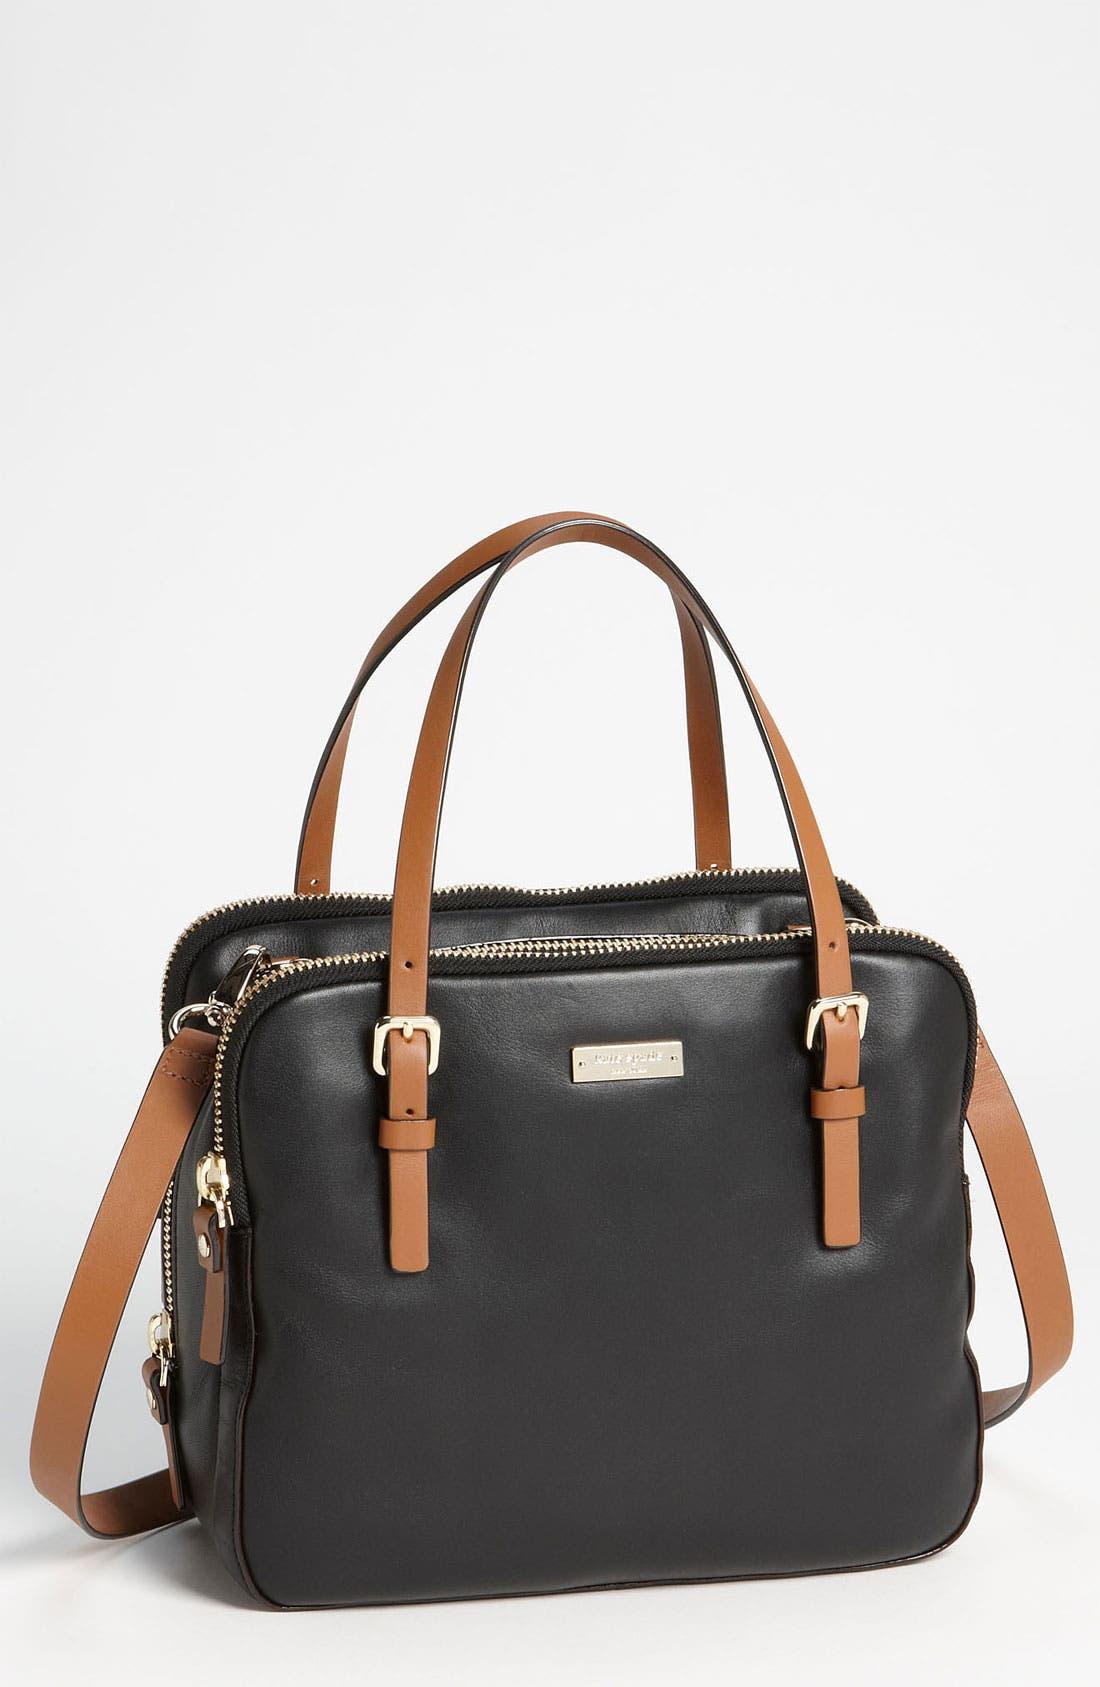 Alternate Image 1 Selected - kate spade new york 'brightbox boulevard - jude' handbag